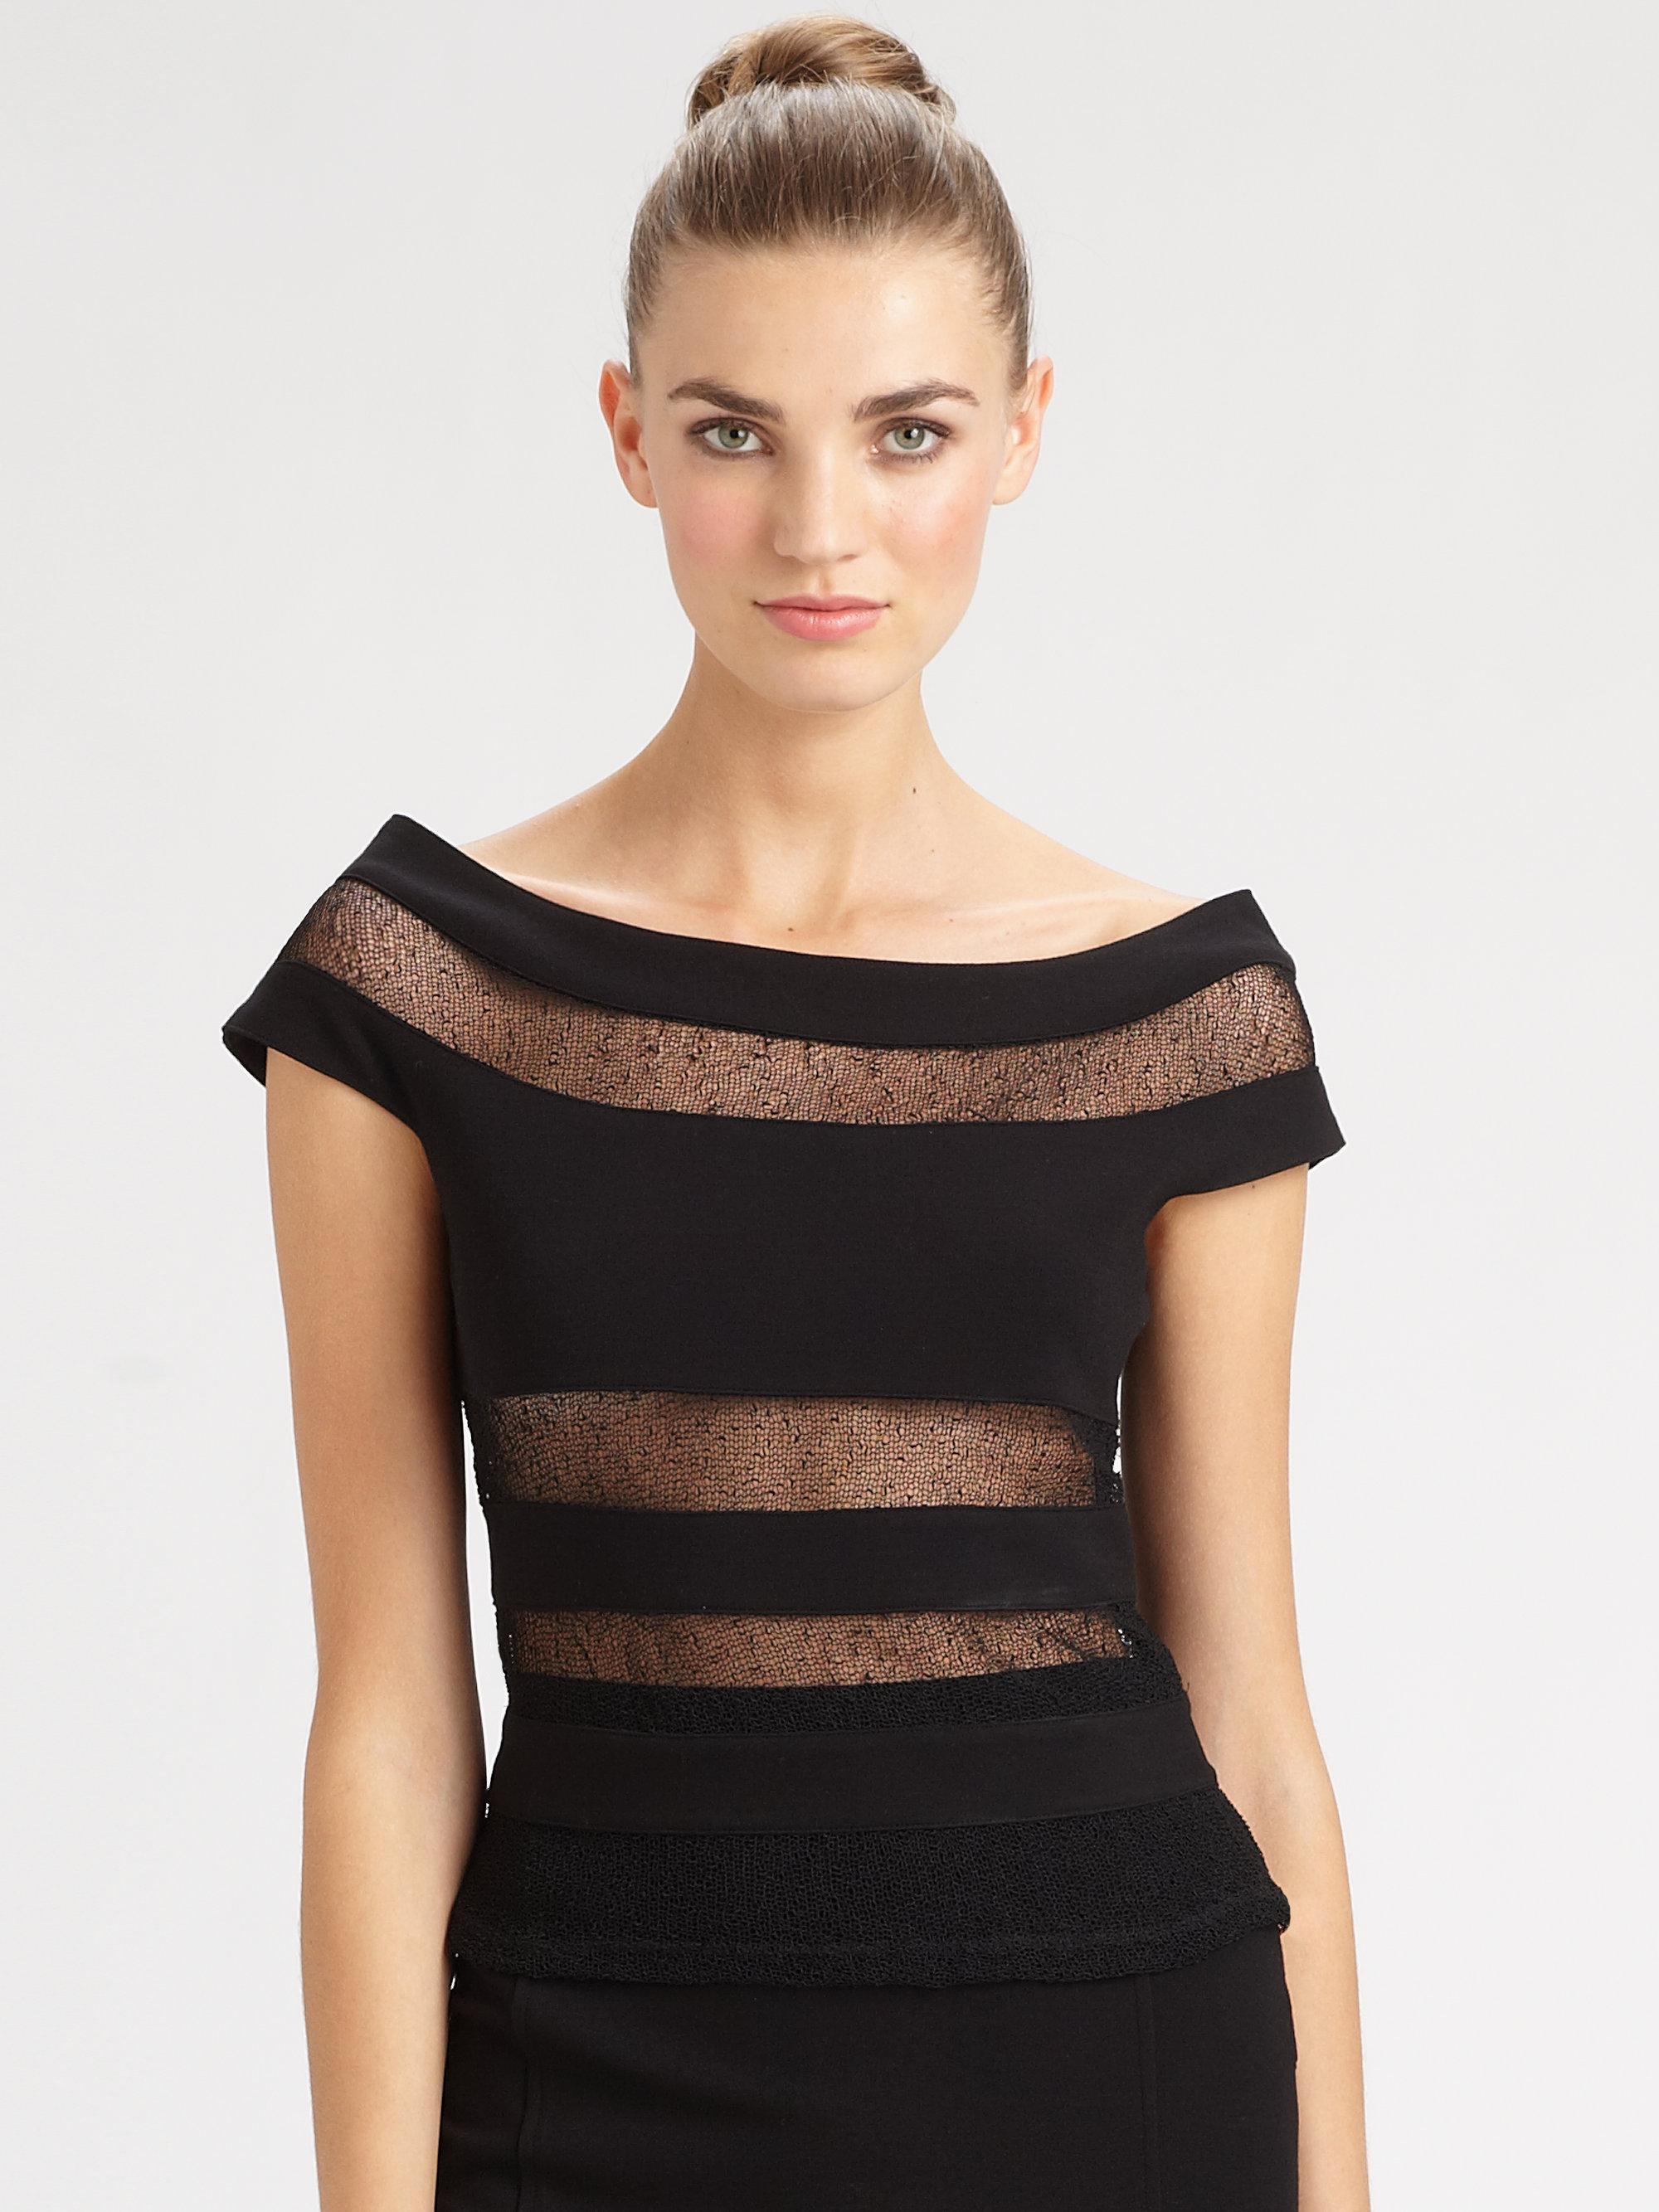 jean paul gaultier sheer stripe top in black lyst. Black Bedroom Furniture Sets. Home Design Ideas